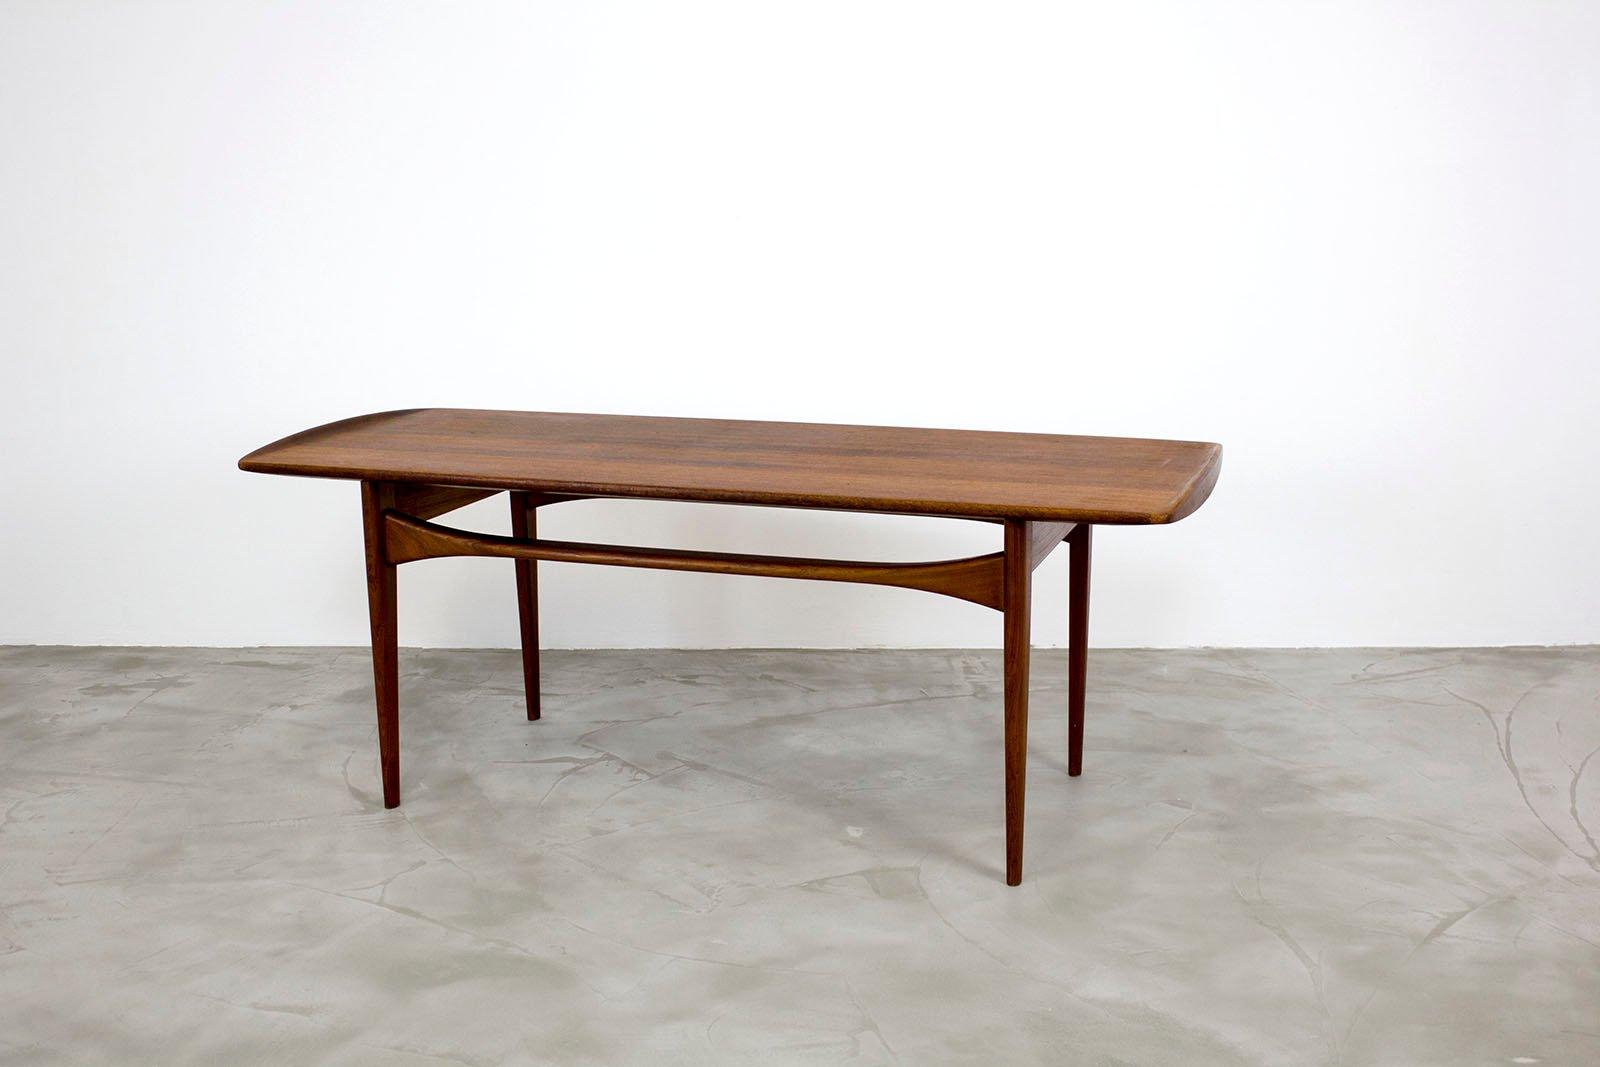 Vintage Danish Teak Coffee Table By Tove U0026 Edvard Kindt Larsen For France U0026  Daverkosen